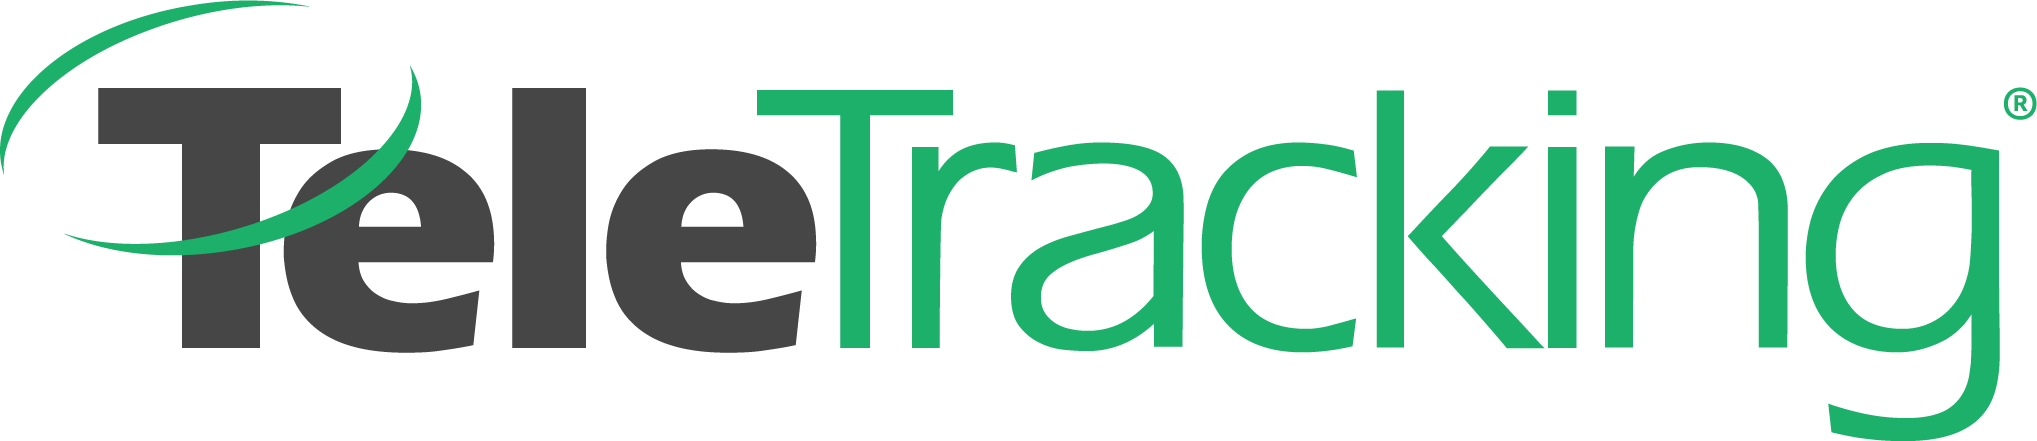 Schedule Details TeleCon18 - TeleTracking Client Conference